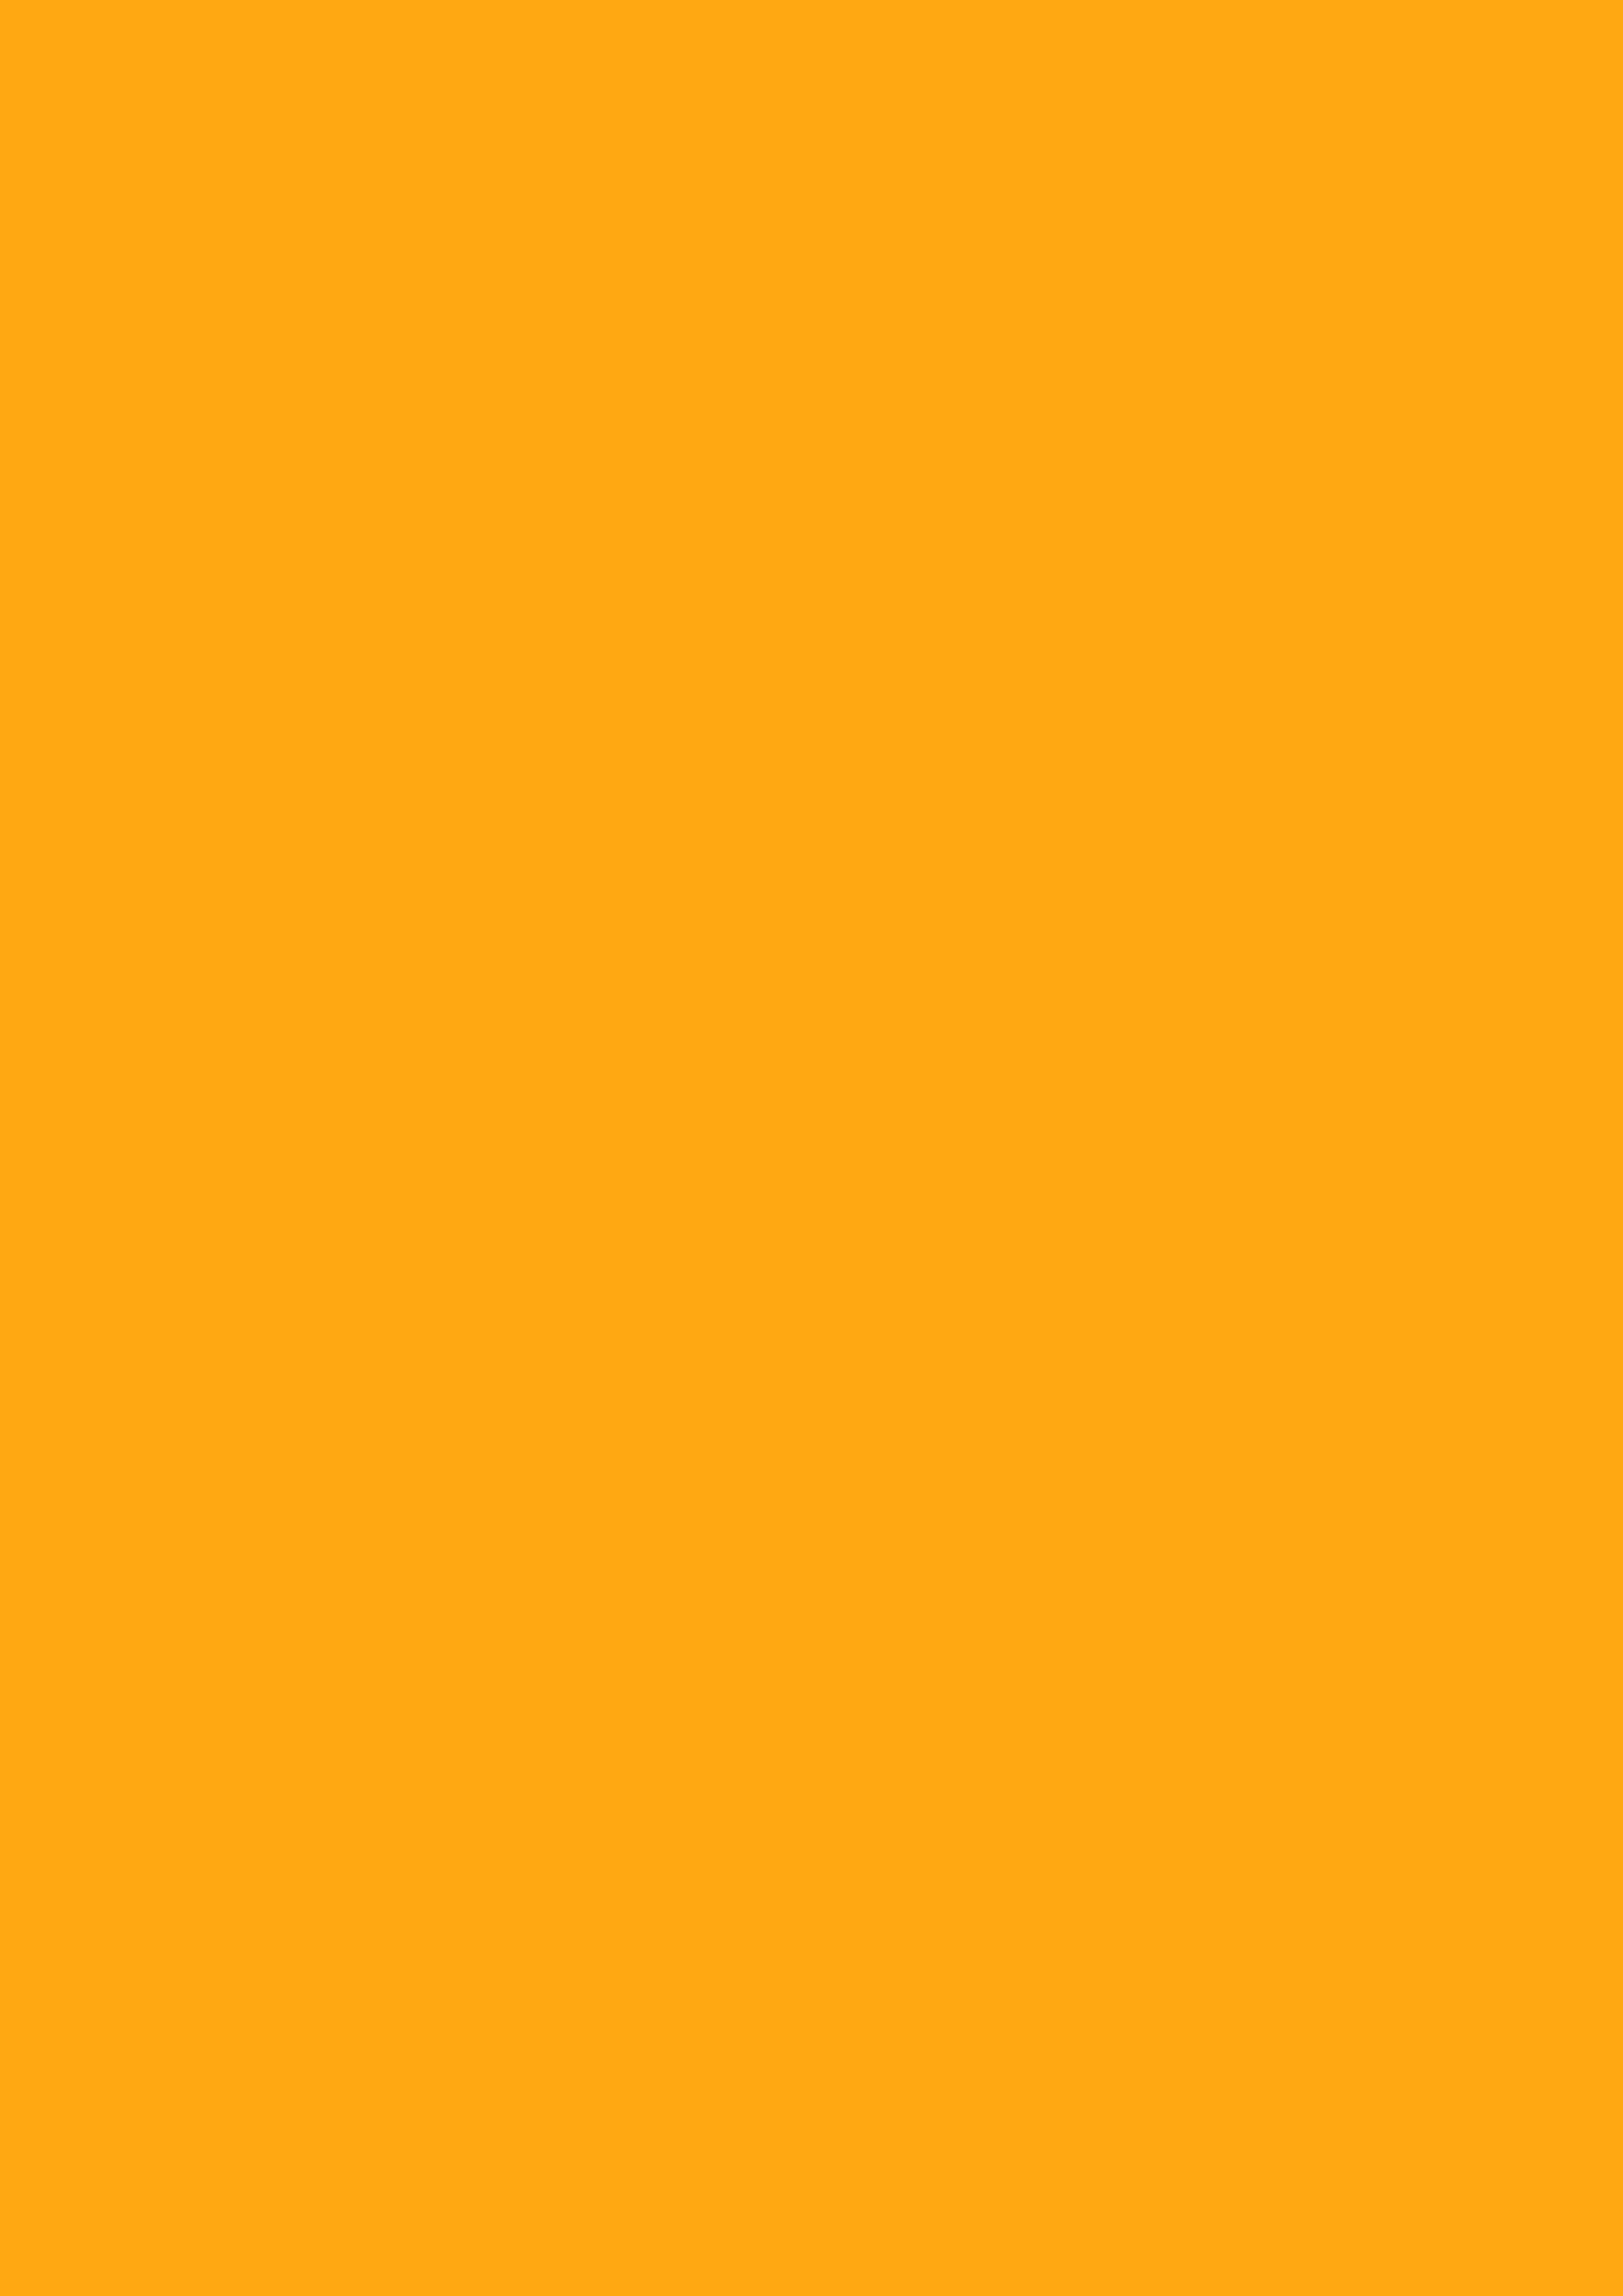 2480x3508 Dark Tangerine Solid Color Background